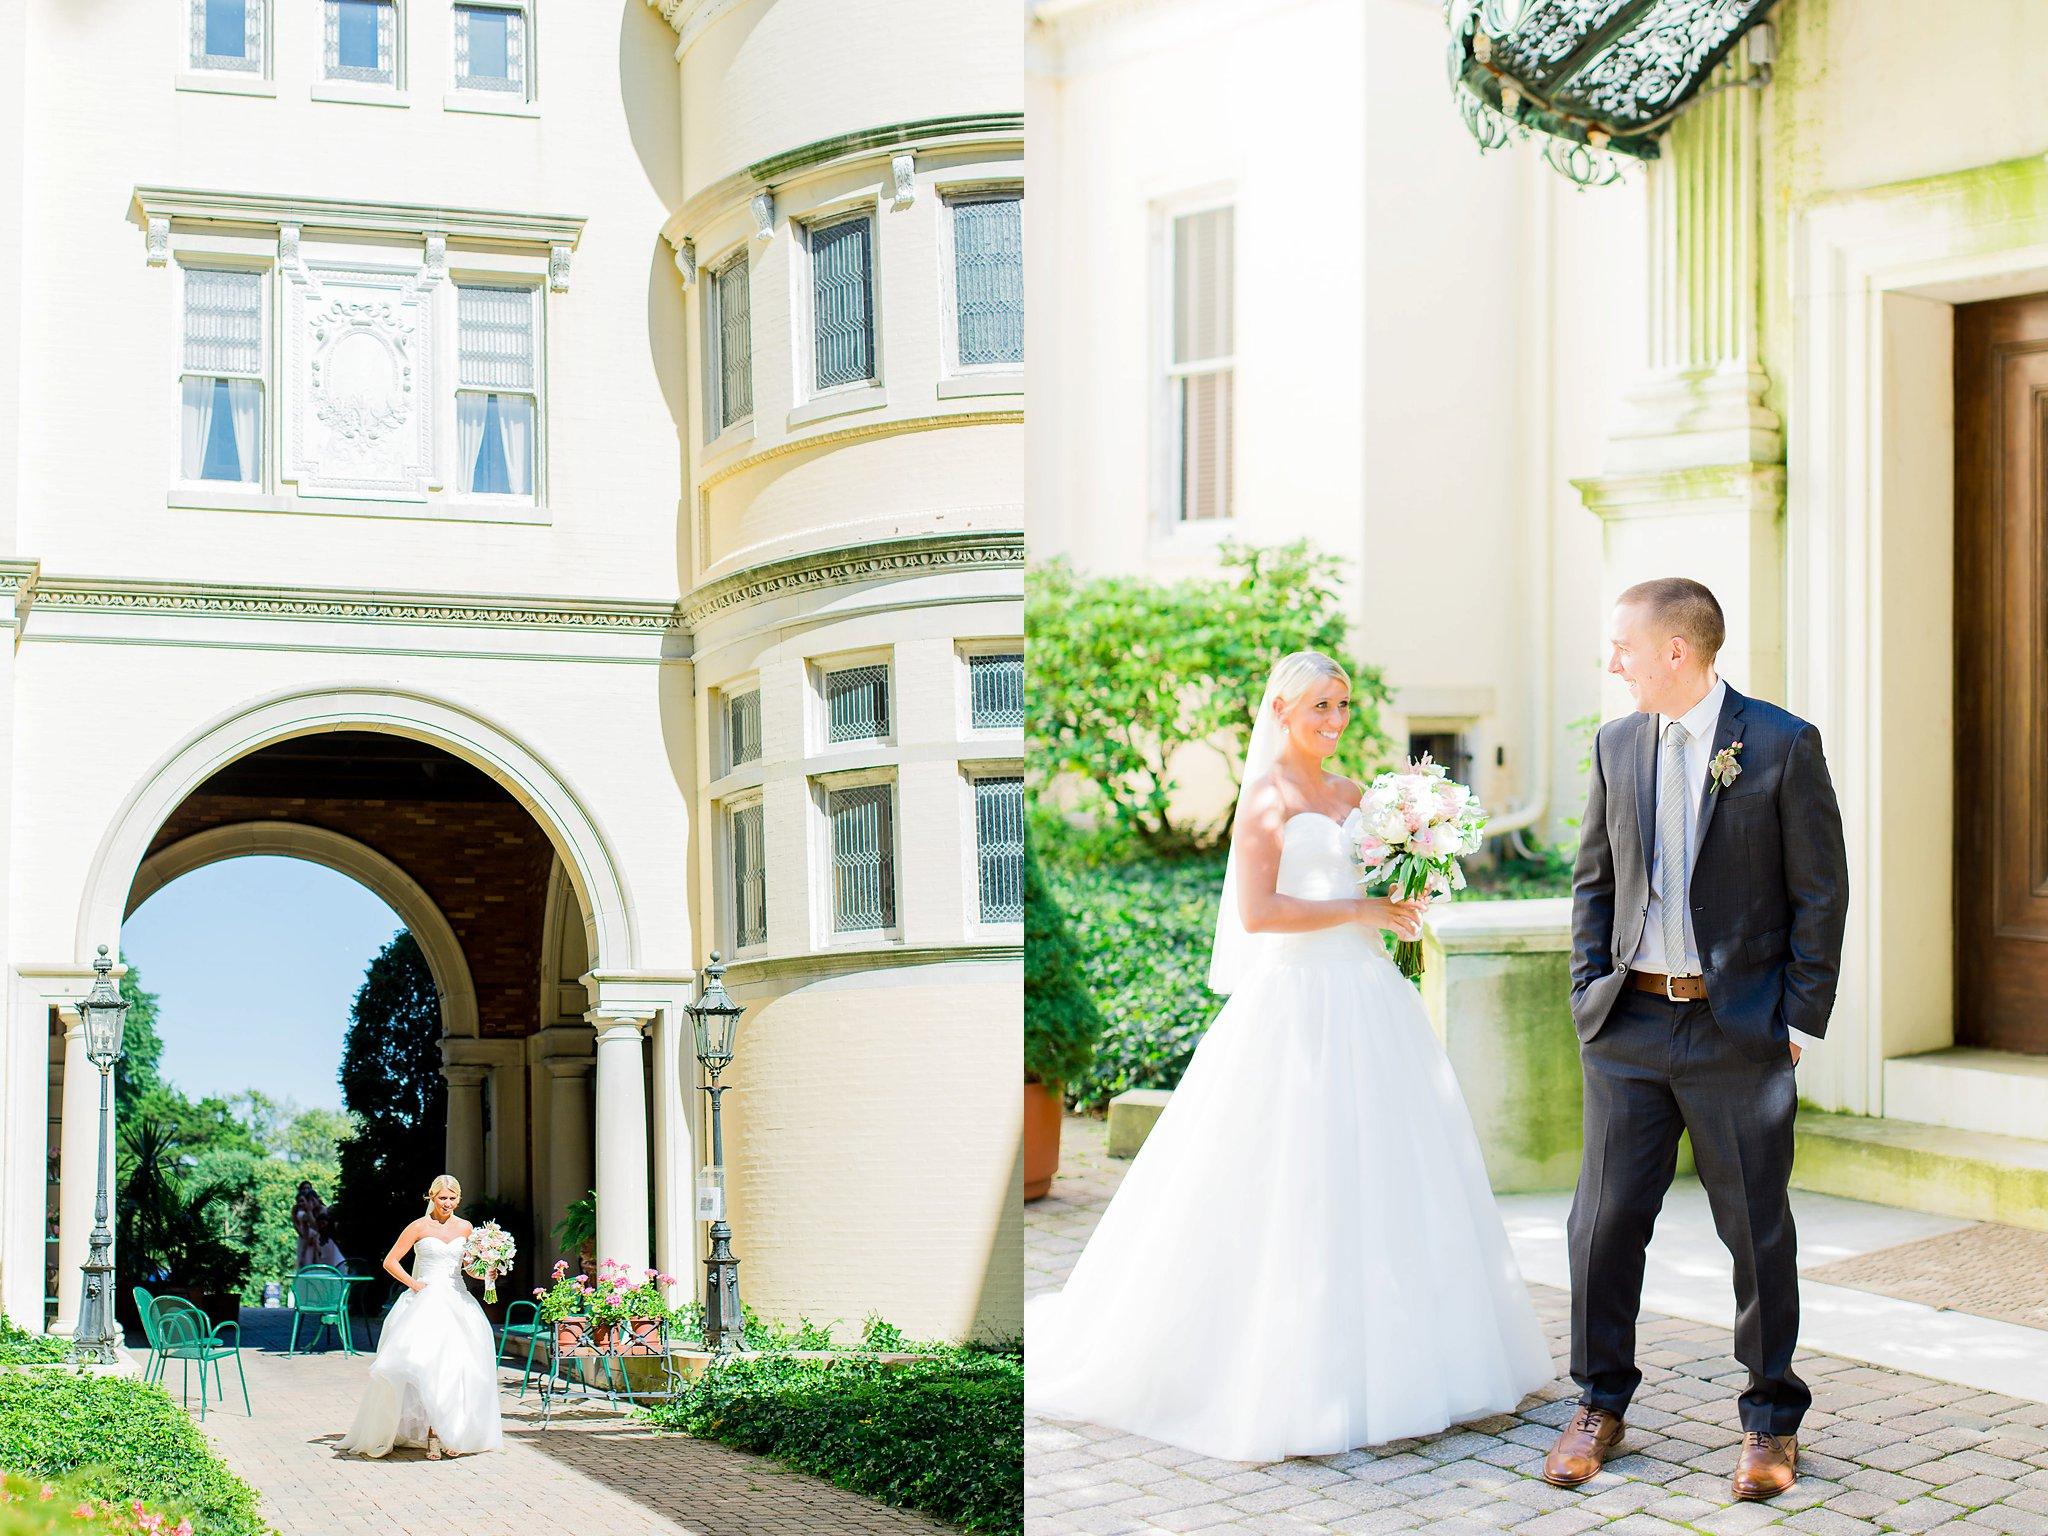 Evergreen Museum & Library Wedding Photos Baltimore Wedding Photographer Kim & Max Megan Kelsey Photography-79.jpg